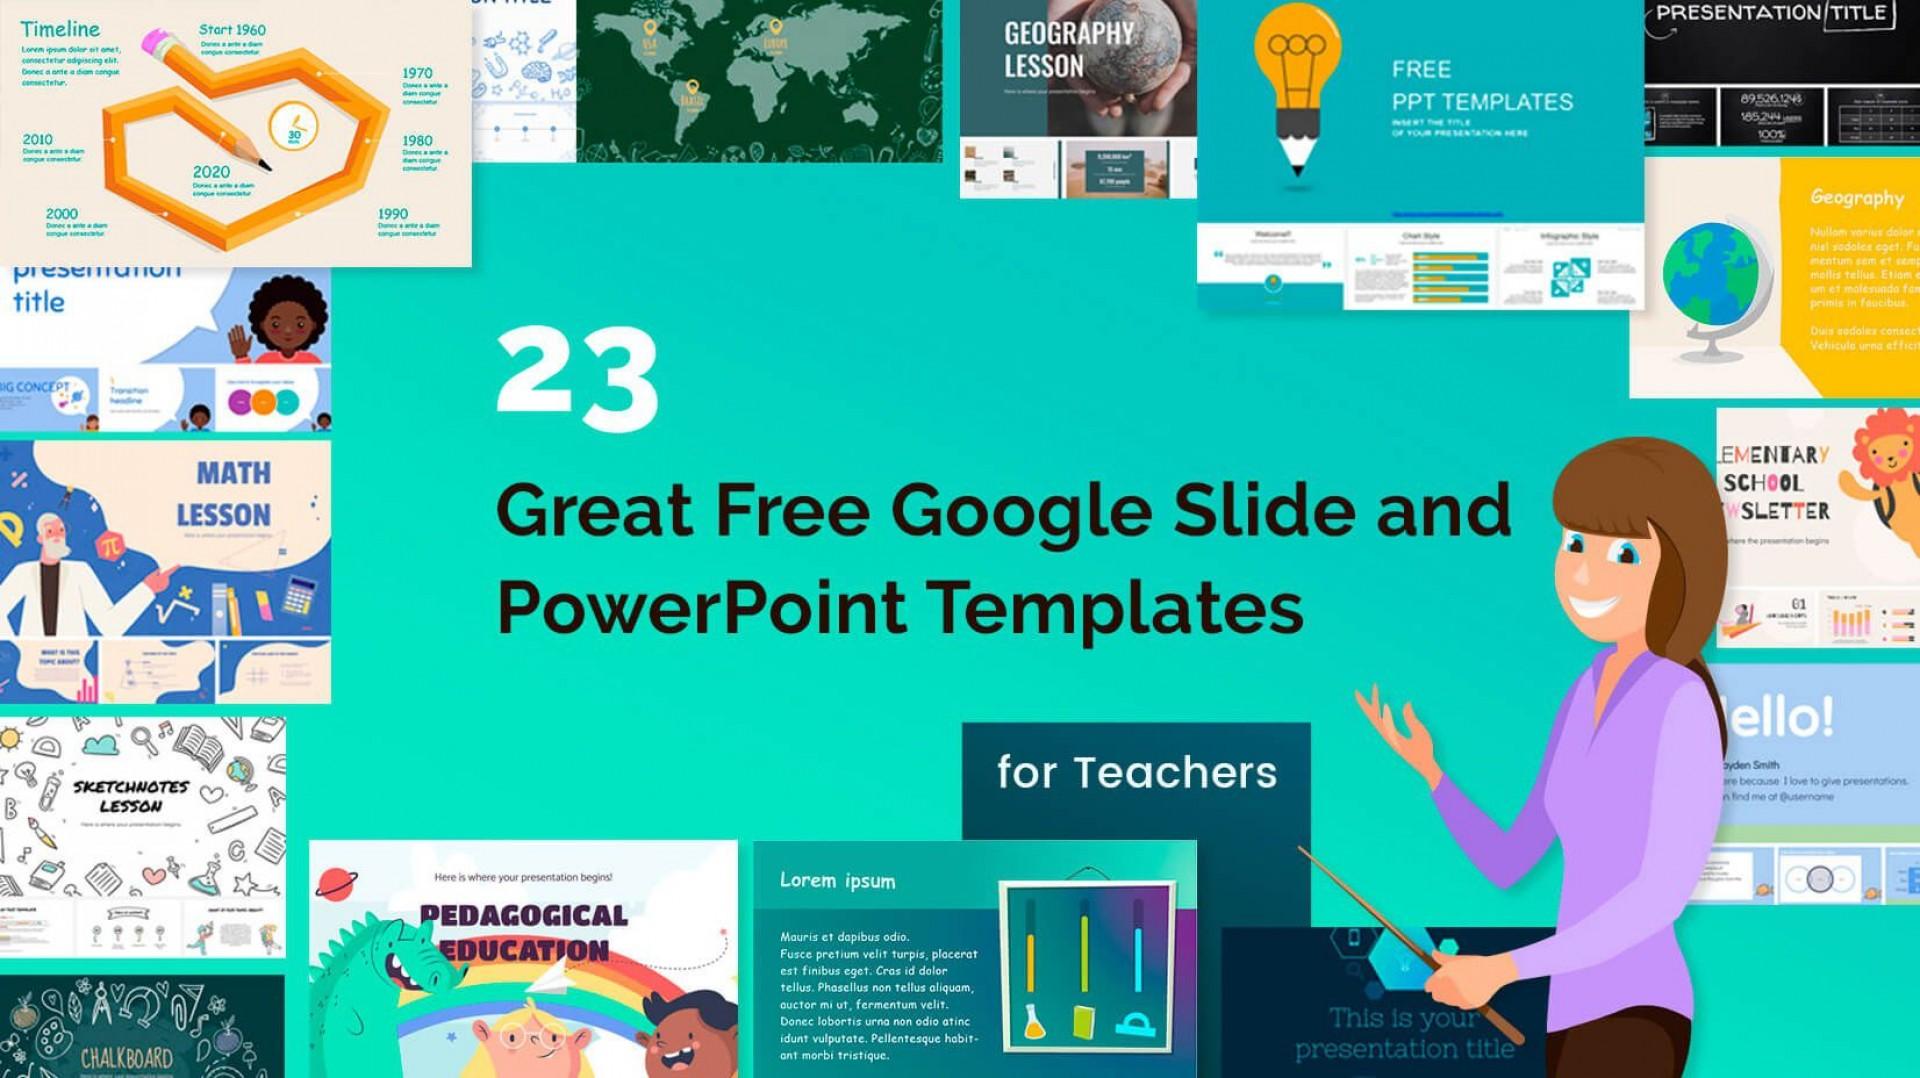 003 Remarkable Ppt Template For Teacher Highest Clarity  Teachers Free Download Powerpoint Education Kindergarten1920